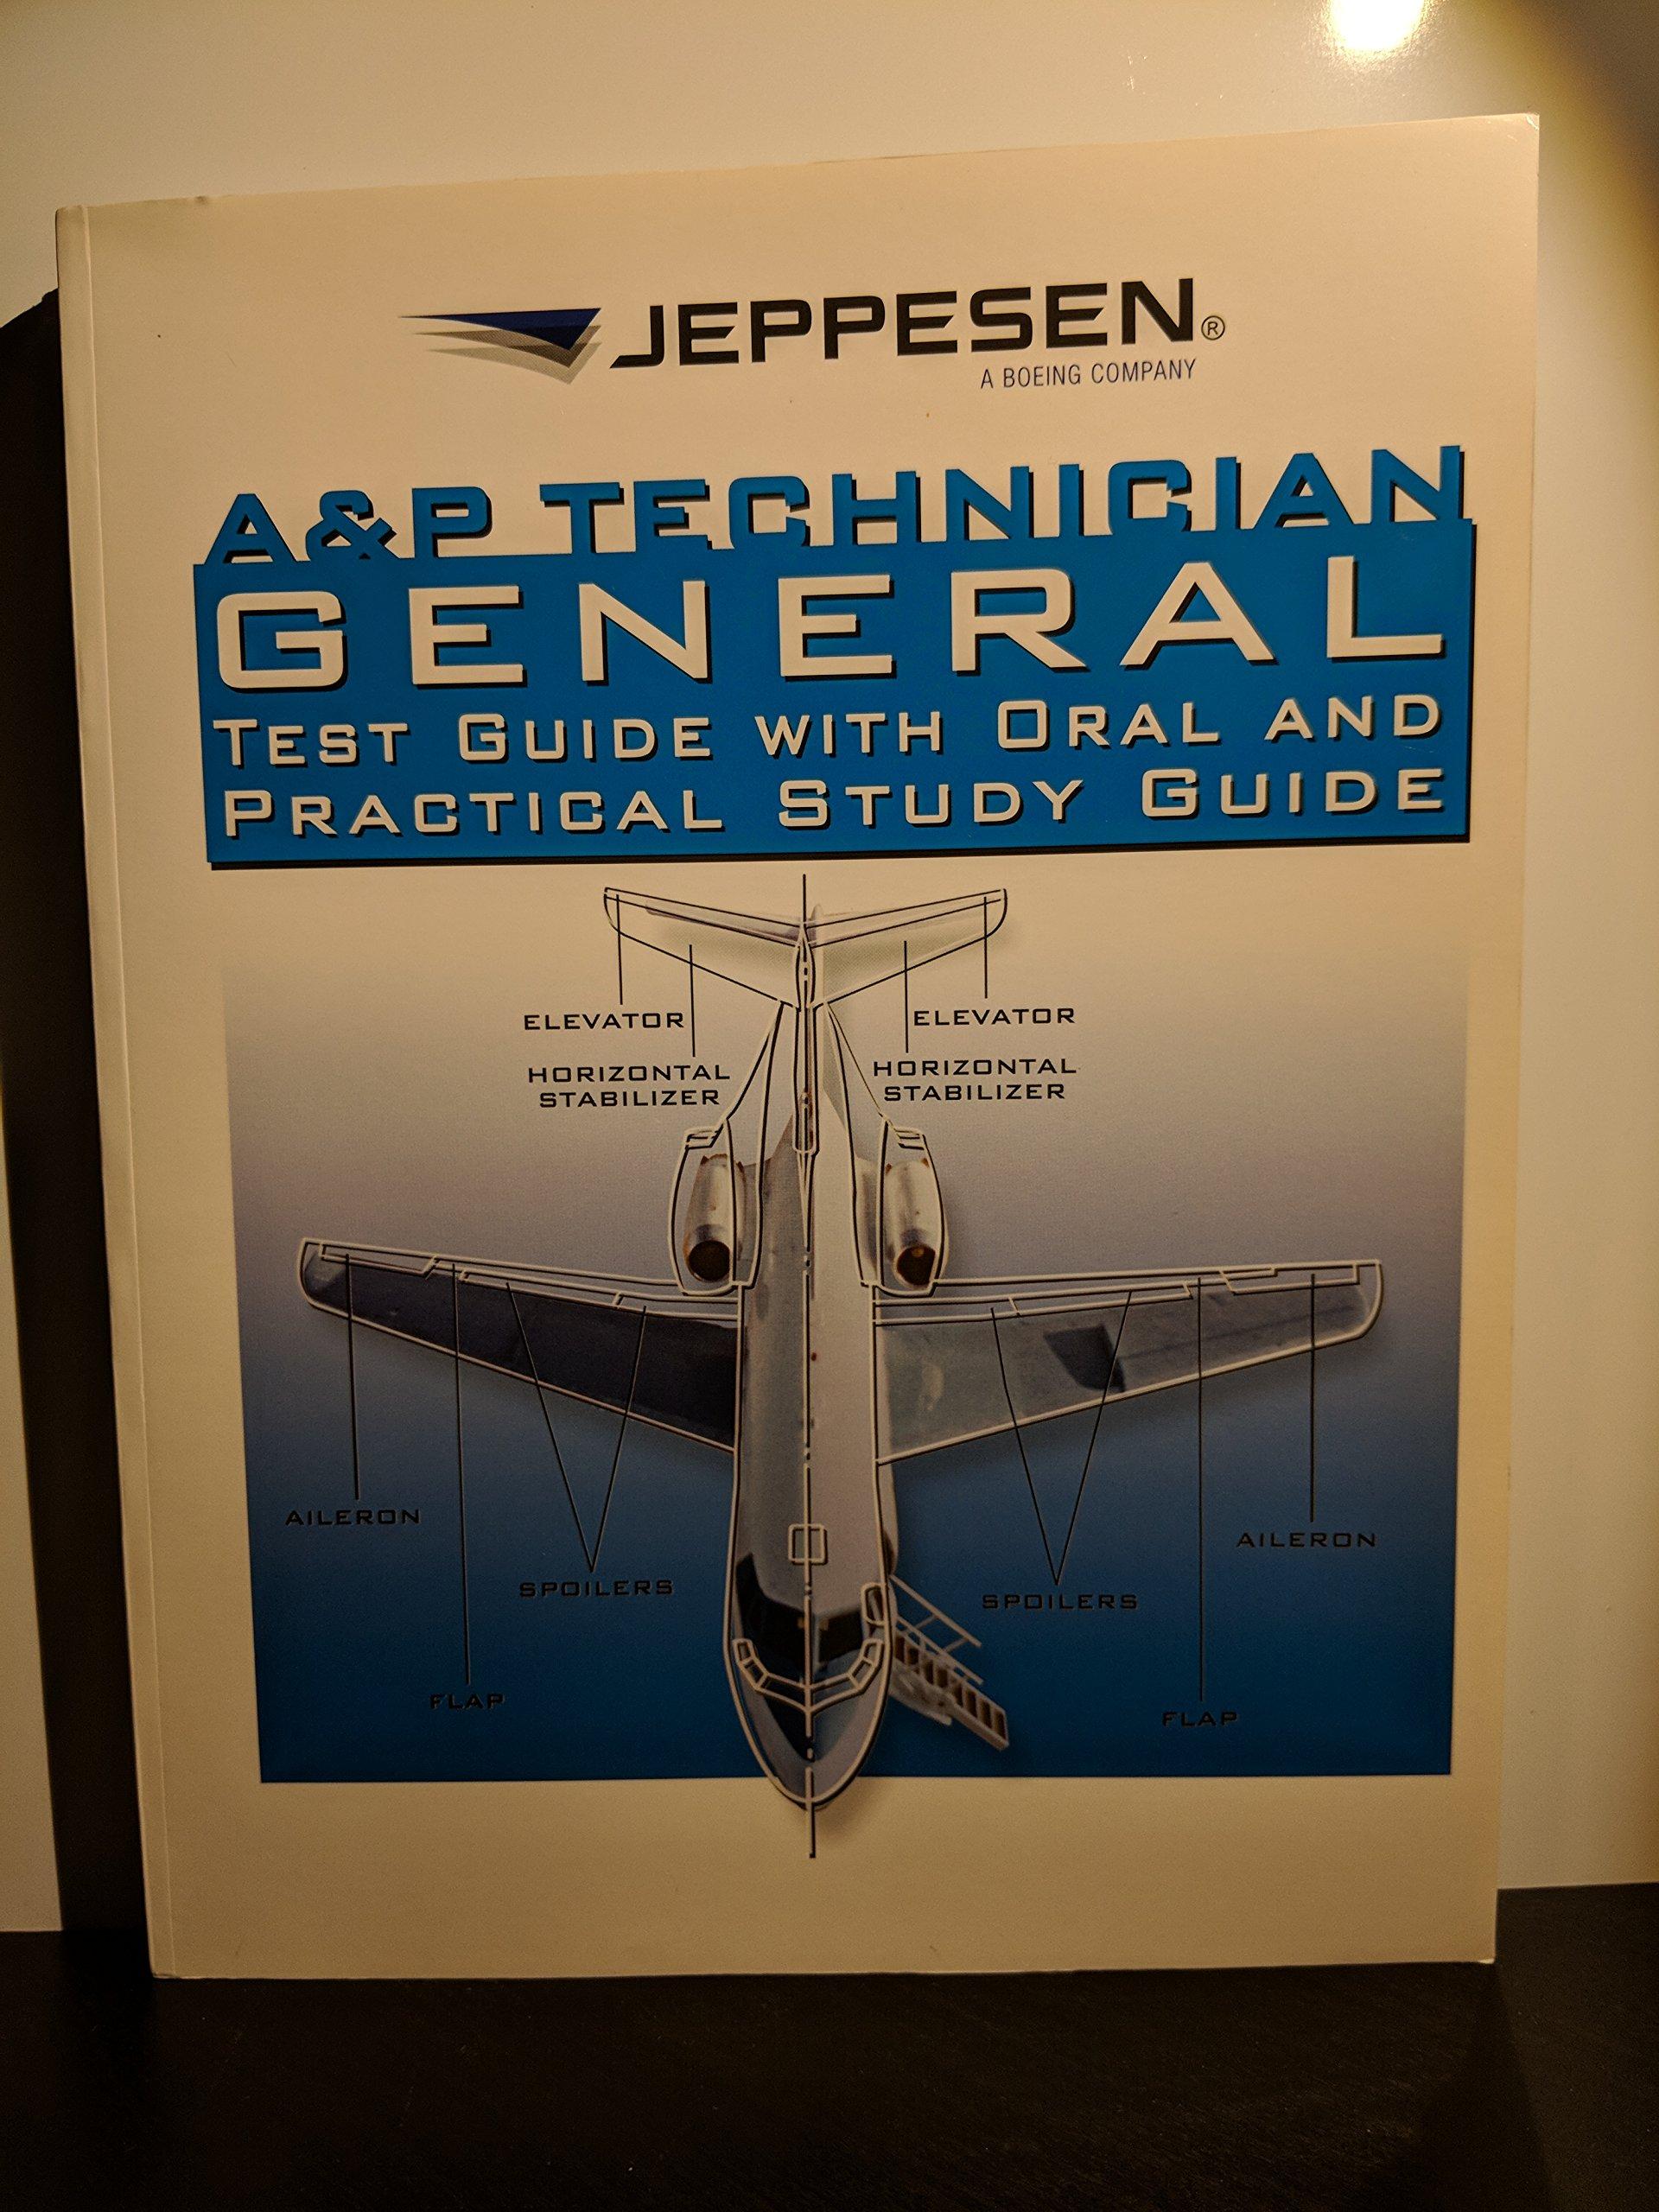 Jeppesen General AMT (A&P) Test Guide - 10002000: Jeppesen: 9780884875420:  Amazon.com: Books